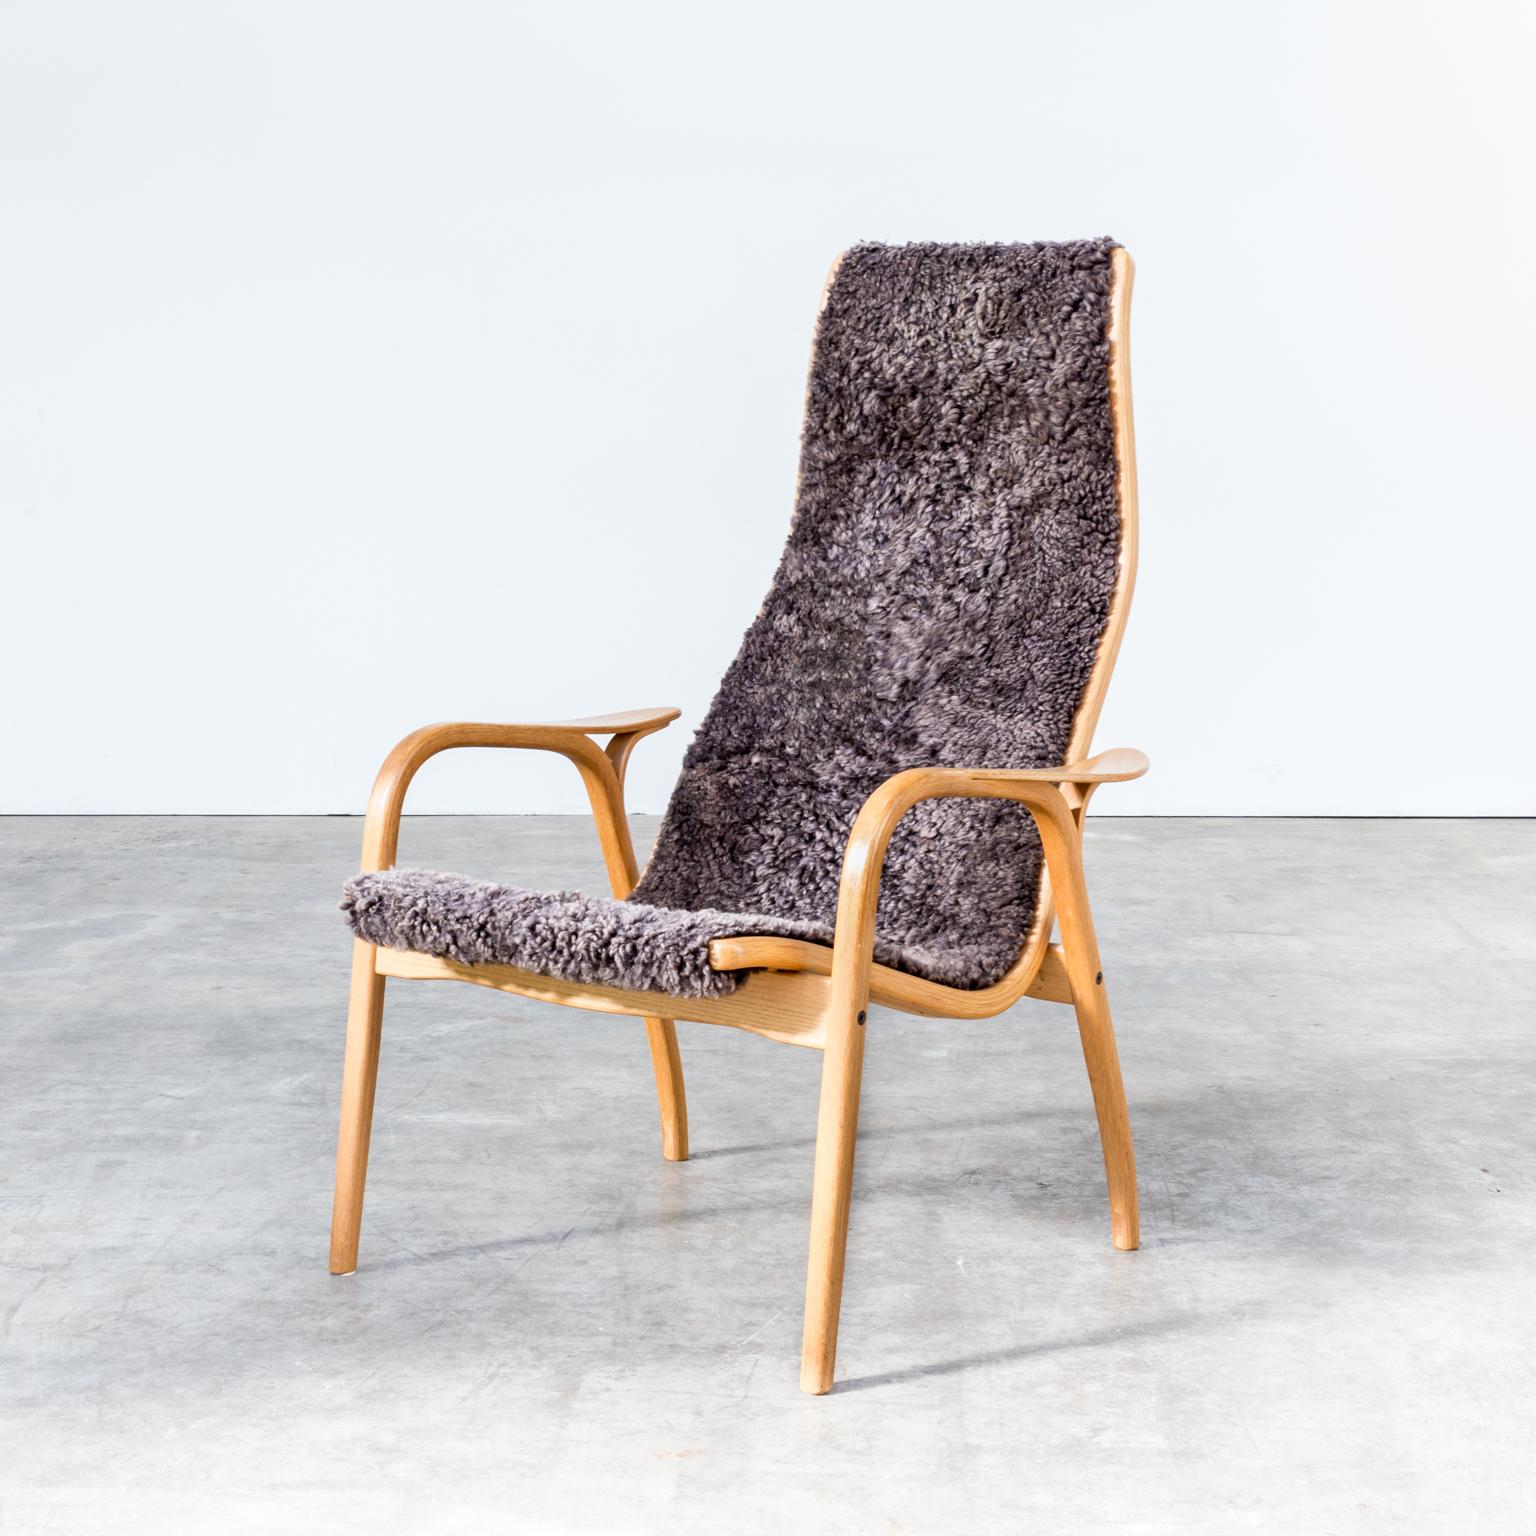 50 u2019s Yngve Ekström u2018Lamino u2019 fauteuil for Swedese Mobler AB BarbMama